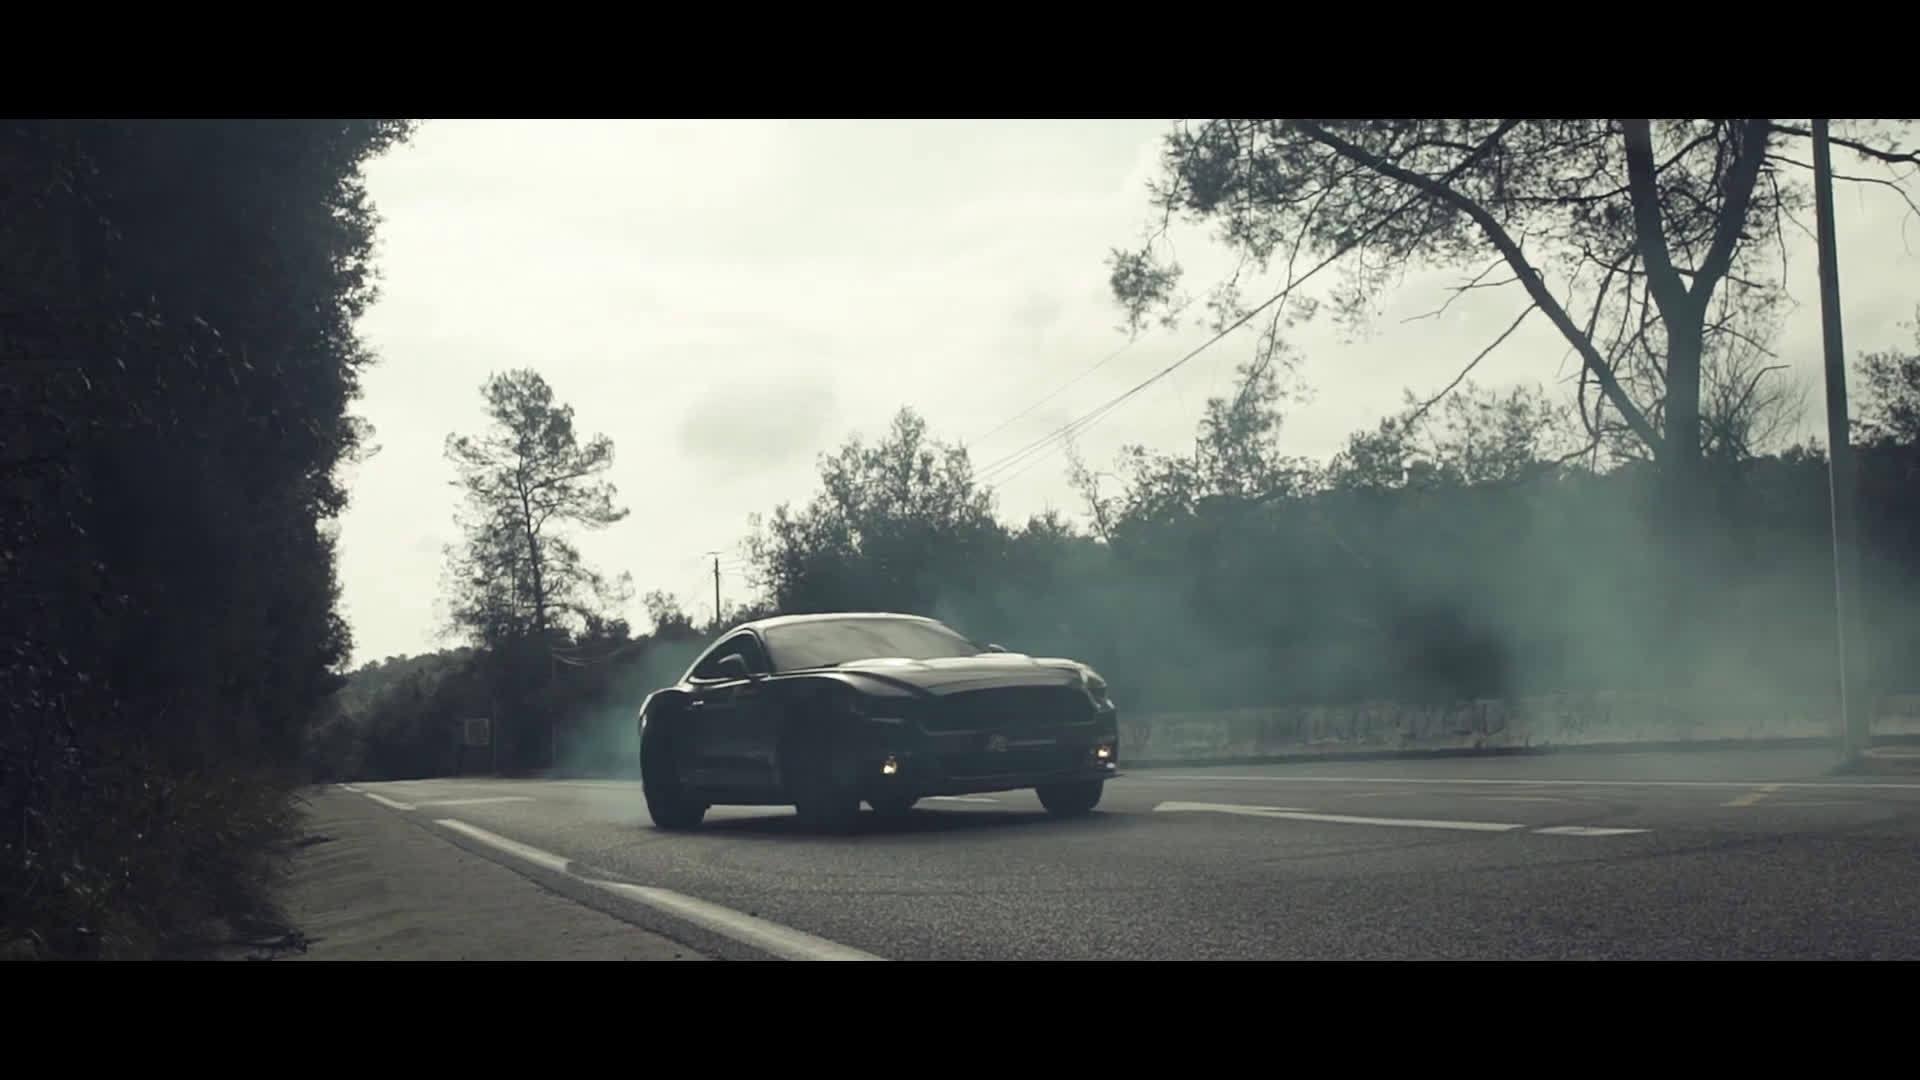 Ford Mustang GT这台野马你觉得如何?